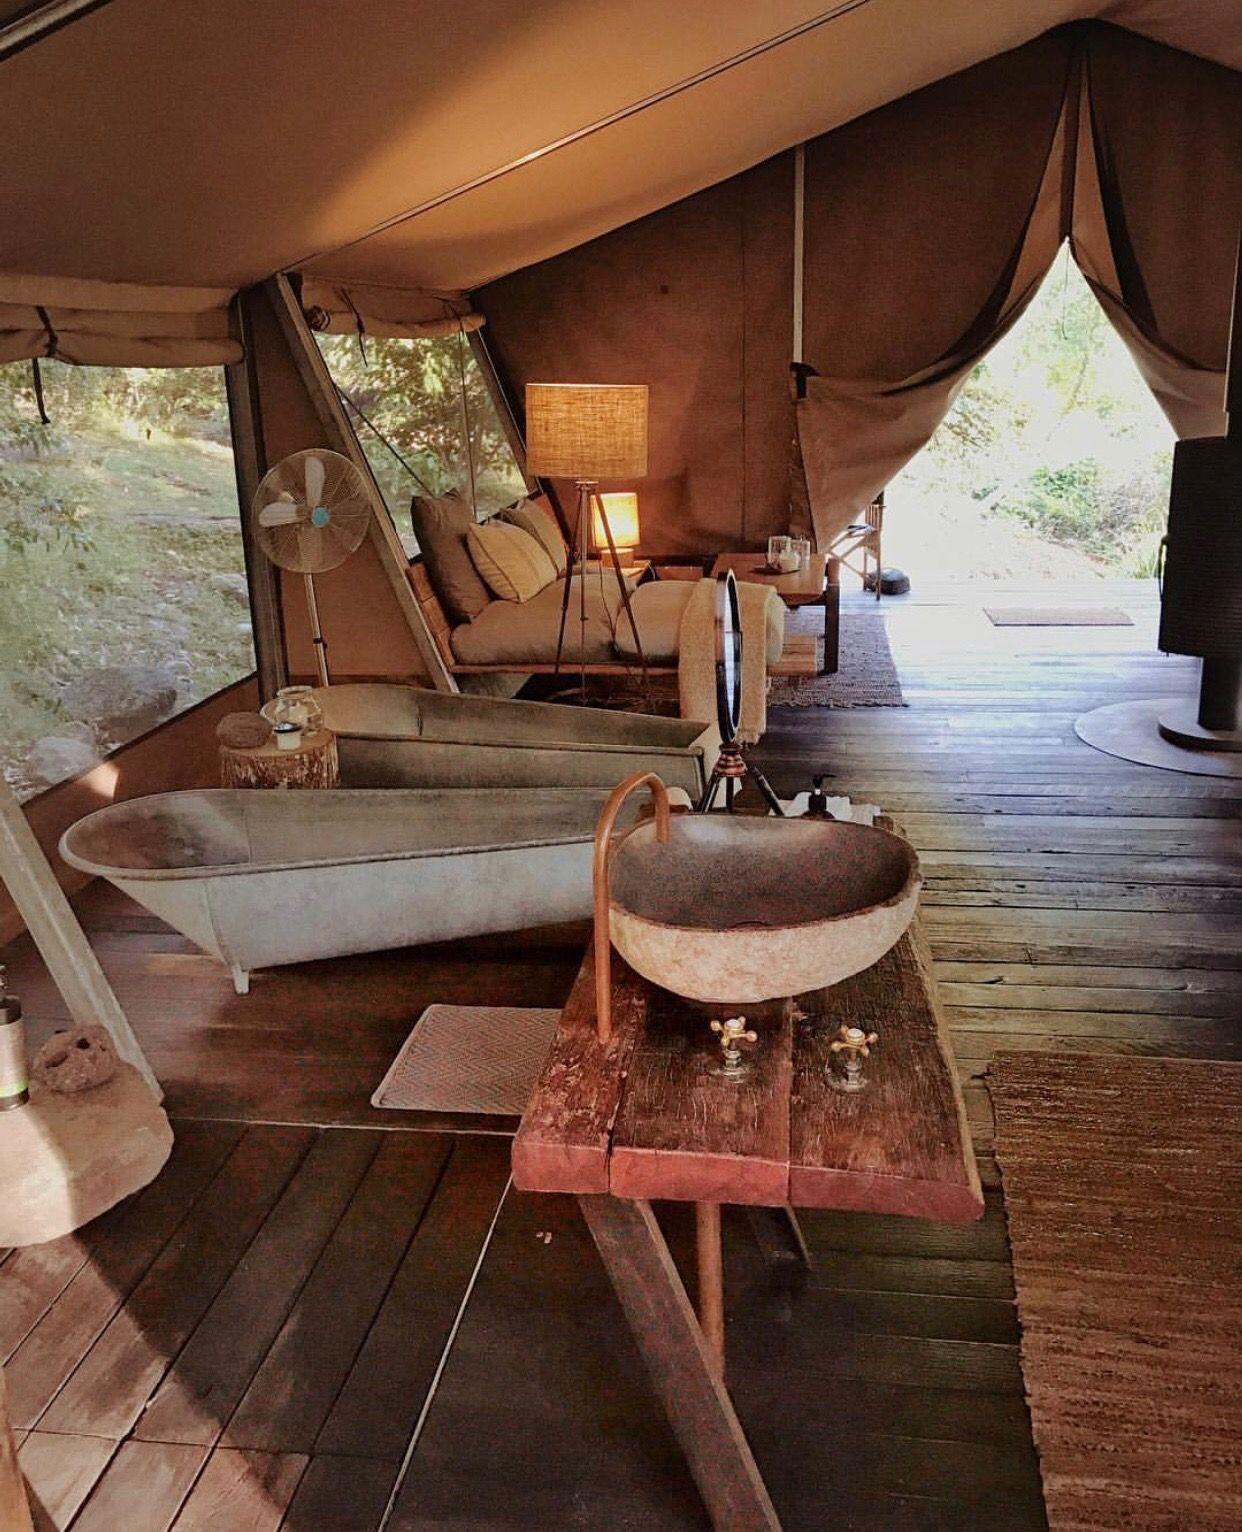 Nightfall Camp | Glamping, Tent glamping, Outdoor life